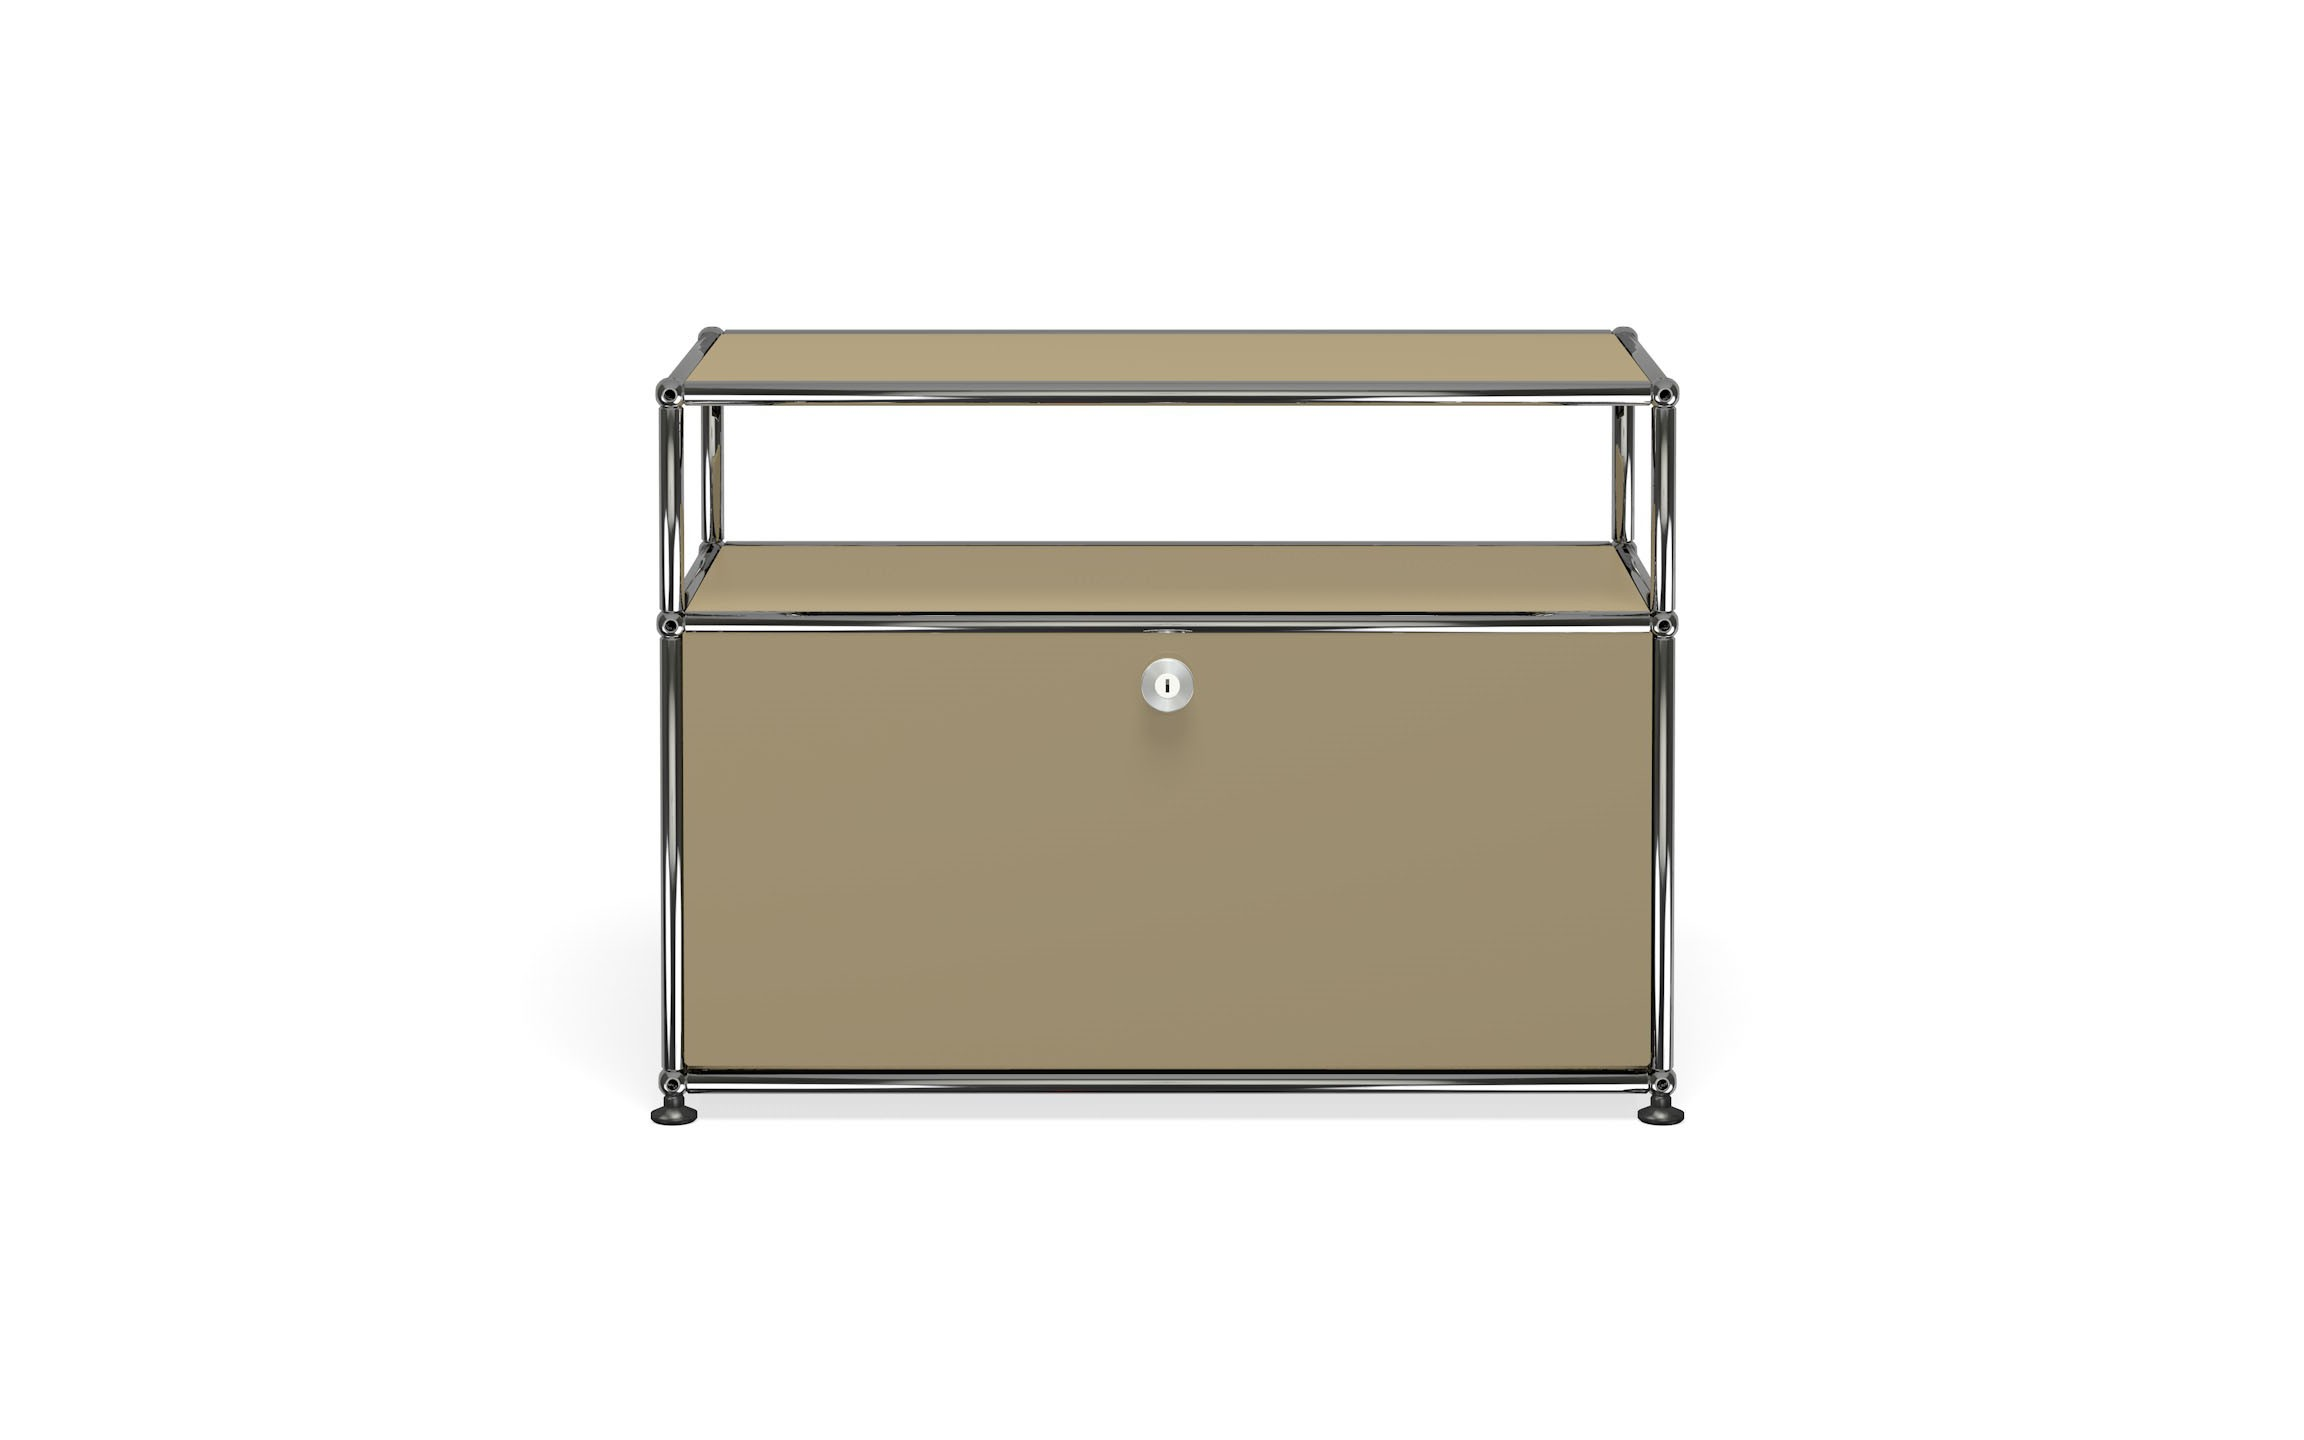 Petit meuble de rangement usm haller m6 beige usm for Petit meuble de rangement